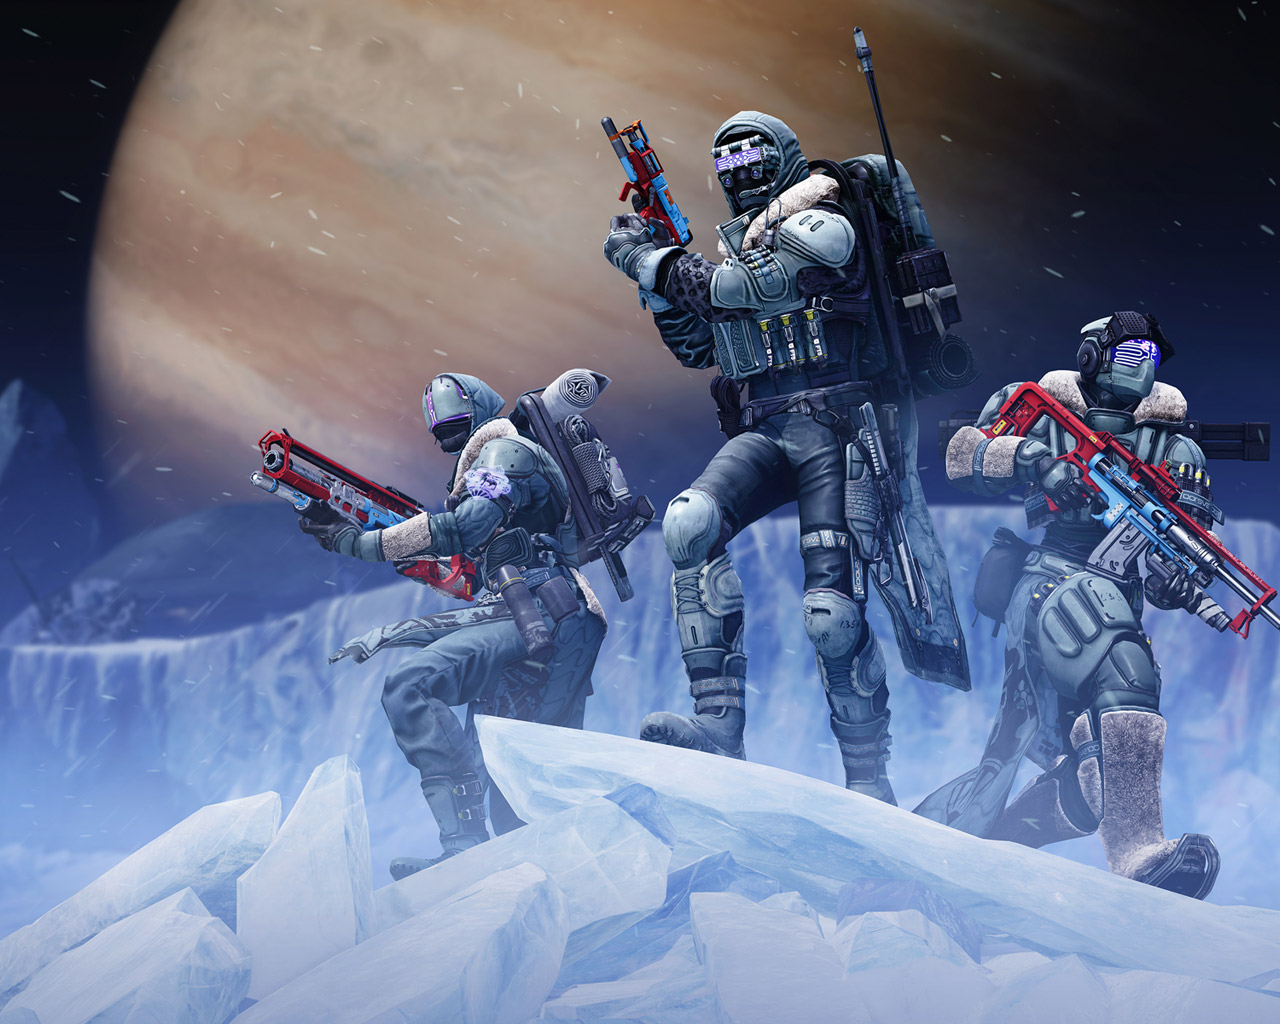 Free Destiny 2 Wallpaper in 1280x1024